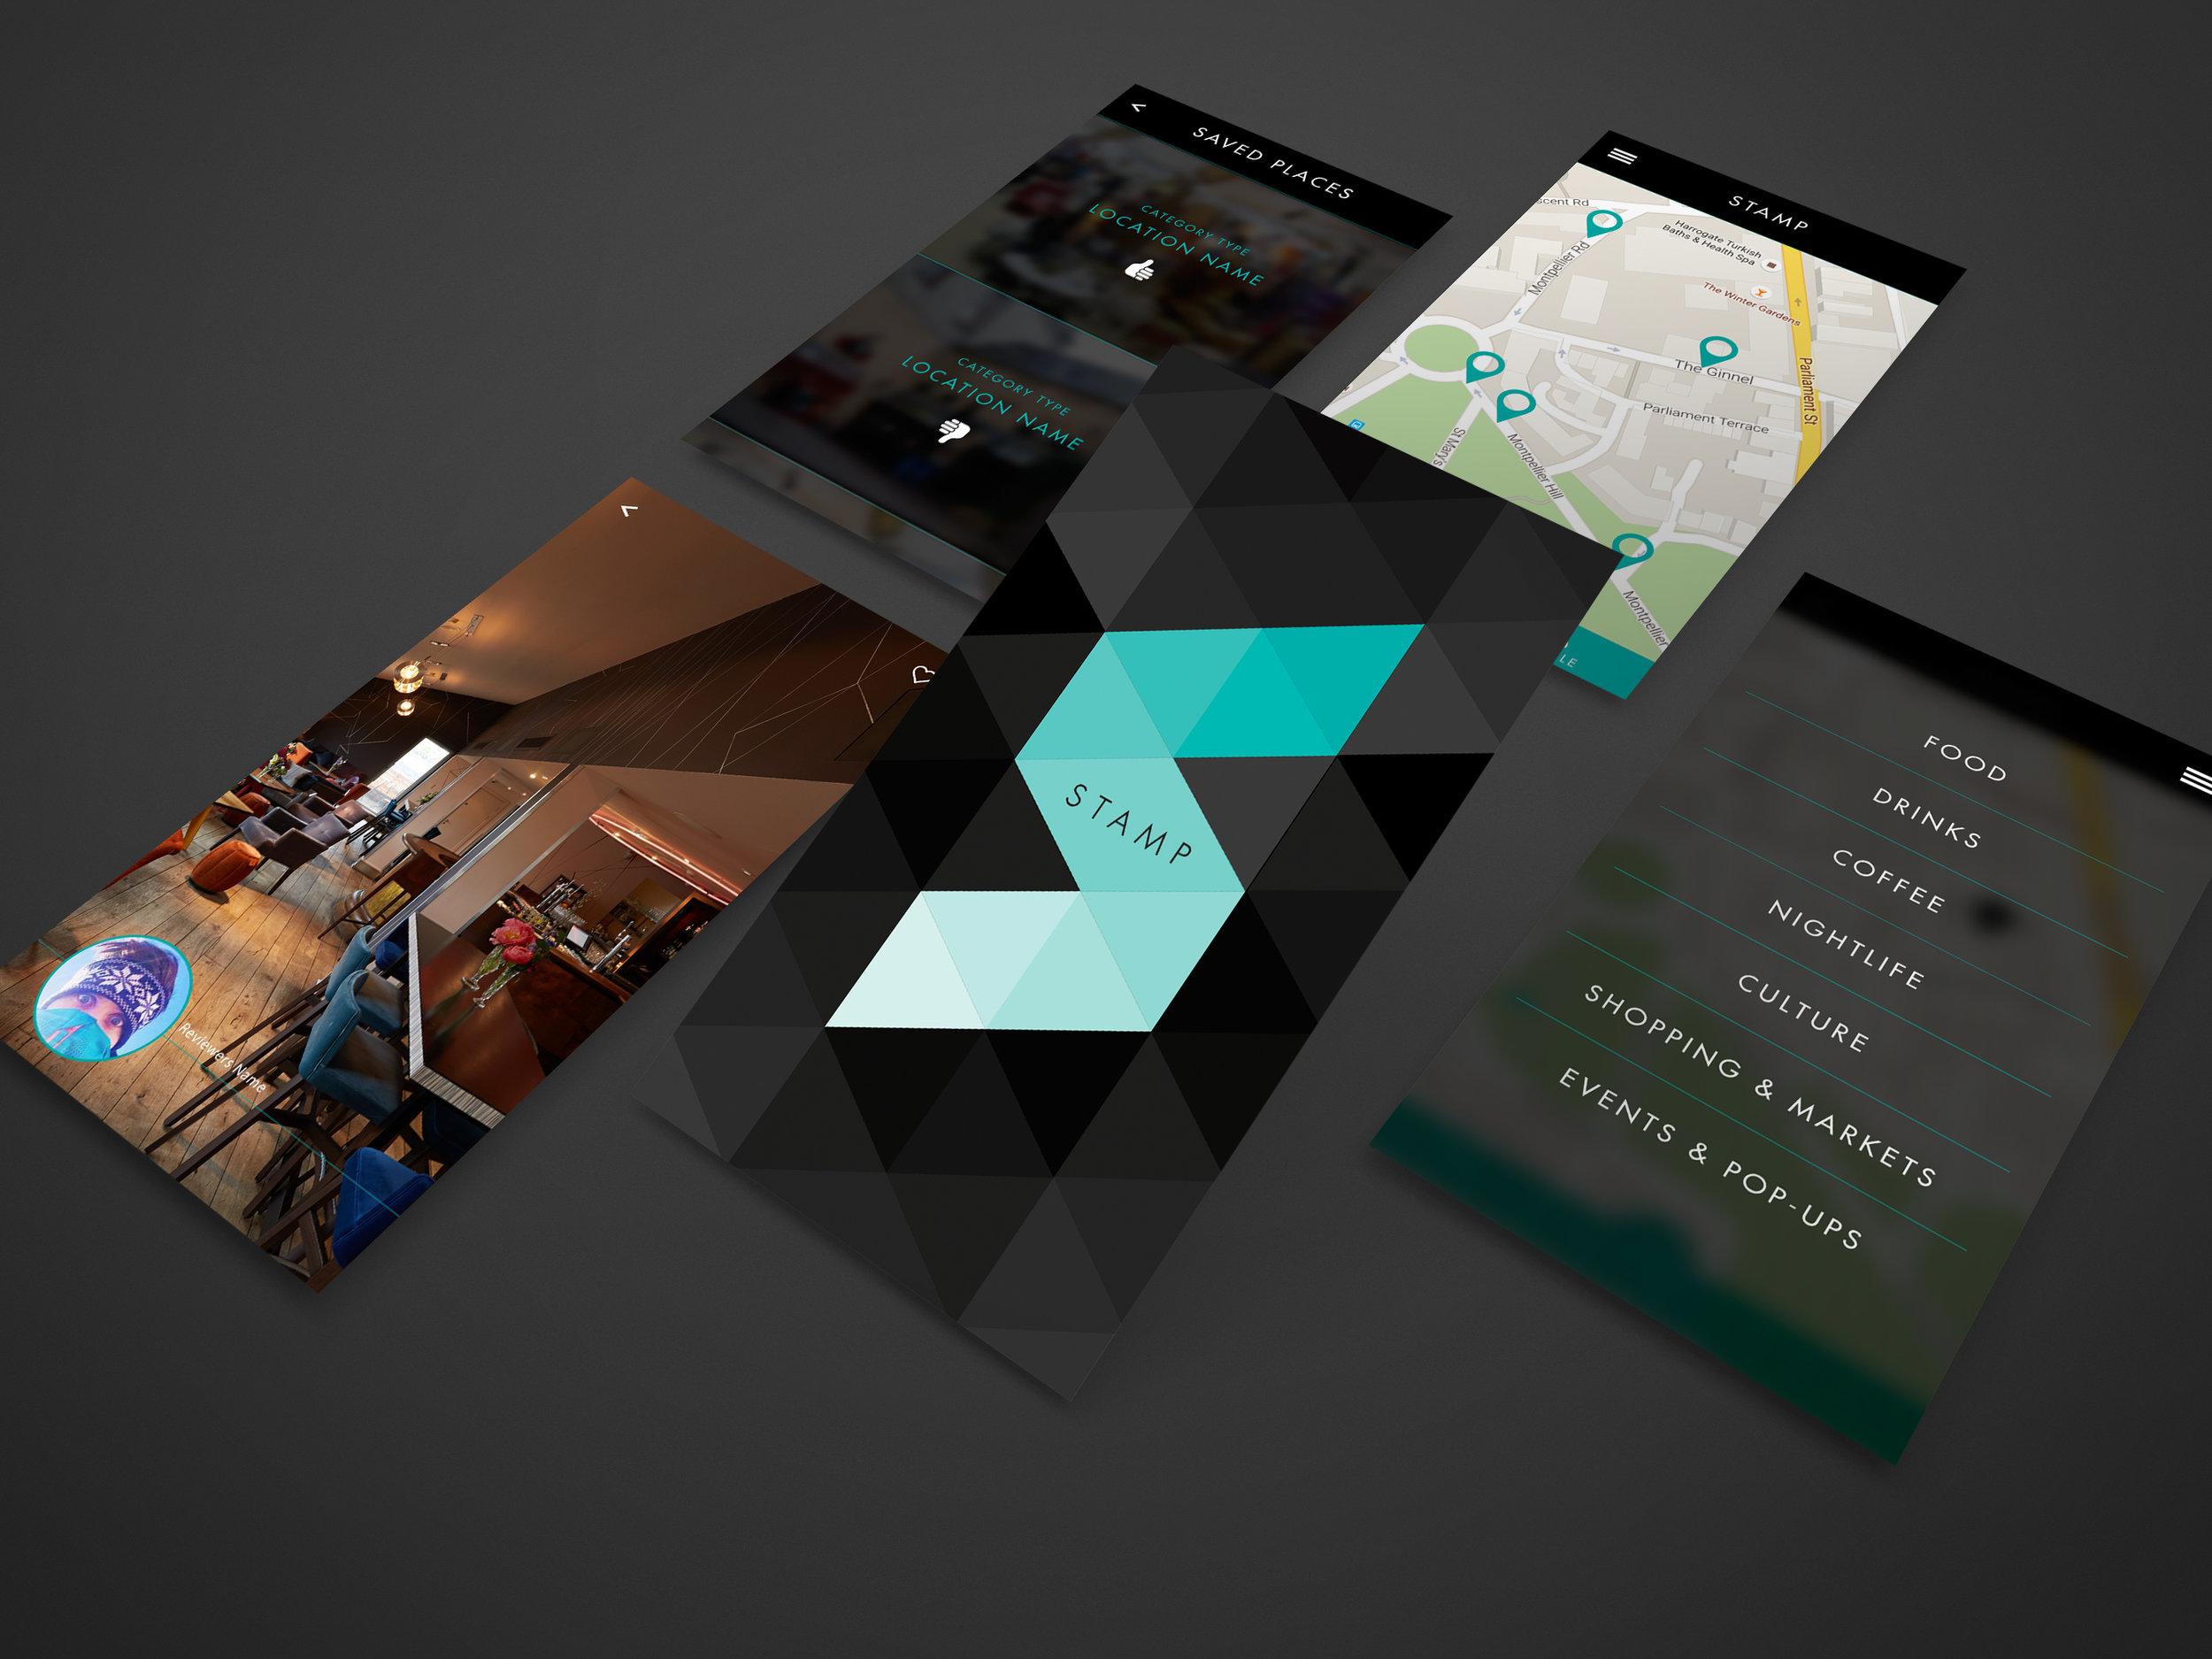 App Screen Showcase Mockup Vol.3.jpg